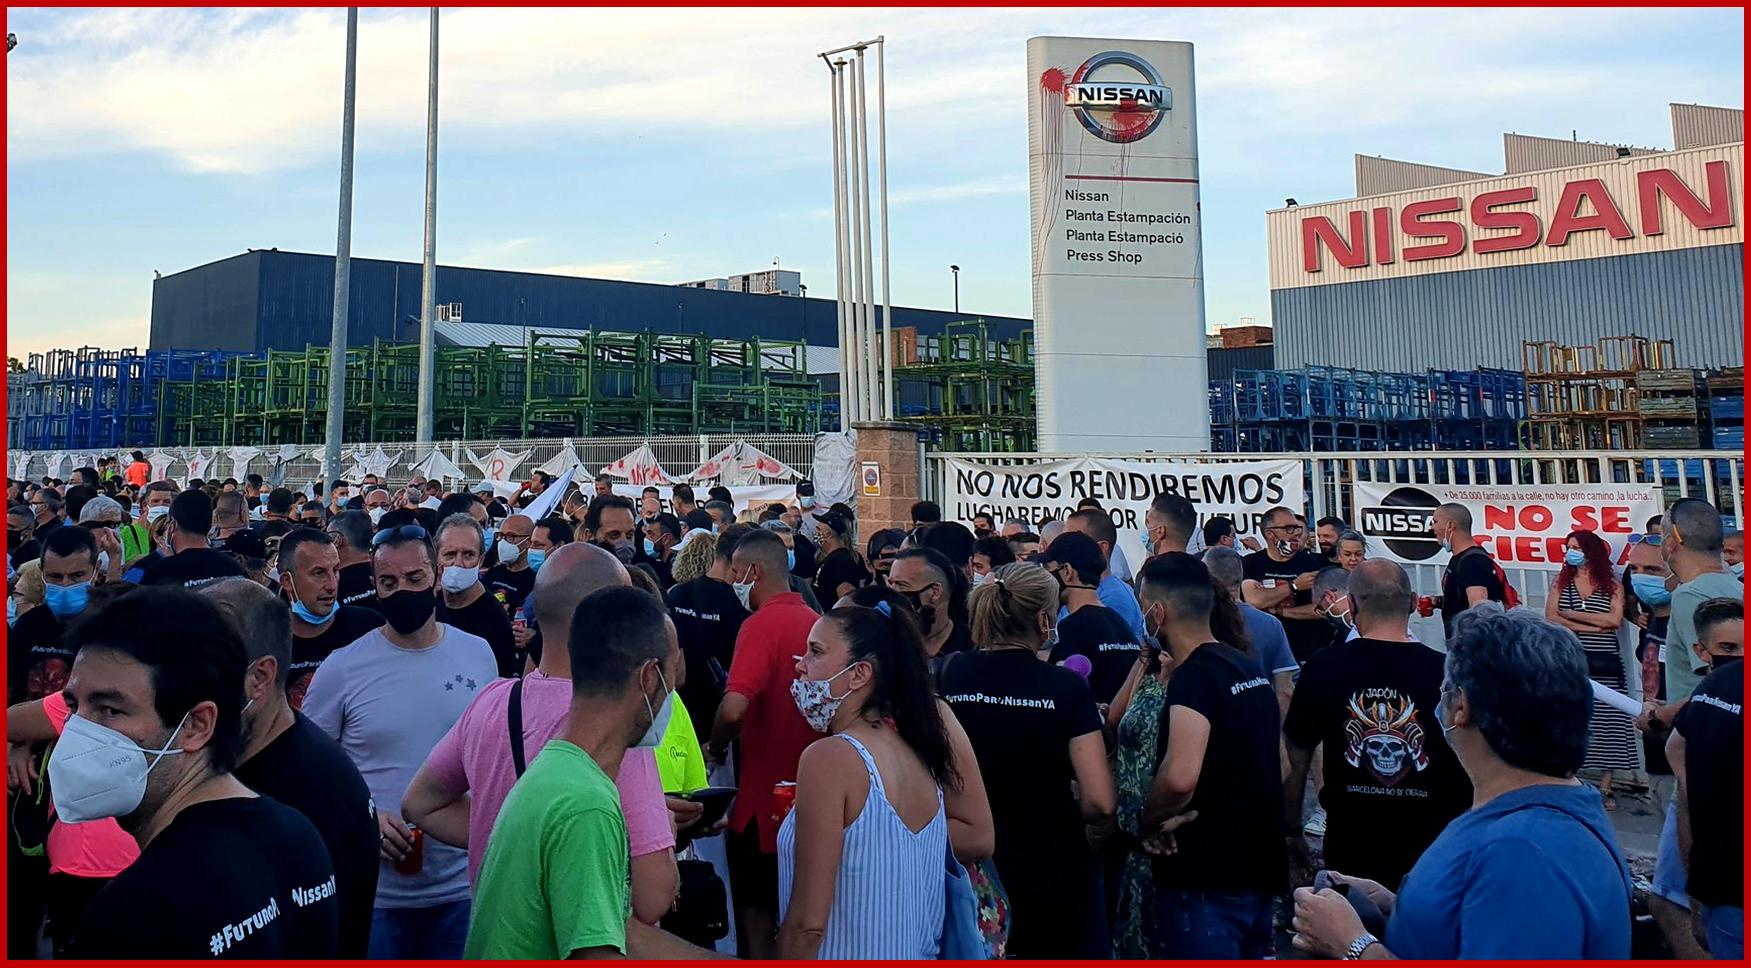 Ken Zino of AutoInformed.com on Nissan Workers on Strike in Spain